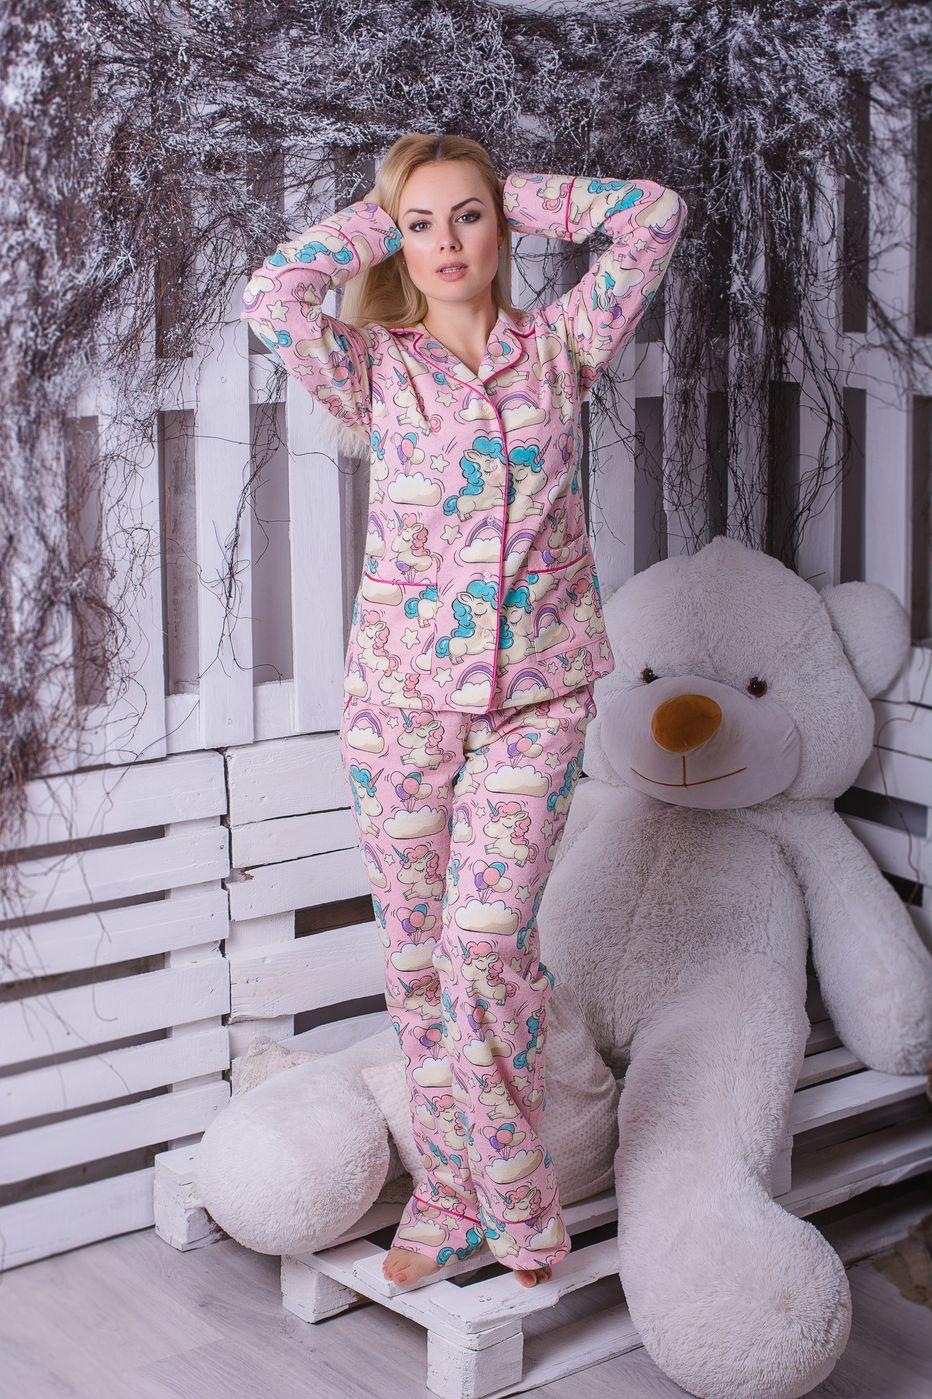 Пижама фланелевая MiaNaGreen П307 Единороги на розовом - купить в ... 438b91f0baf65